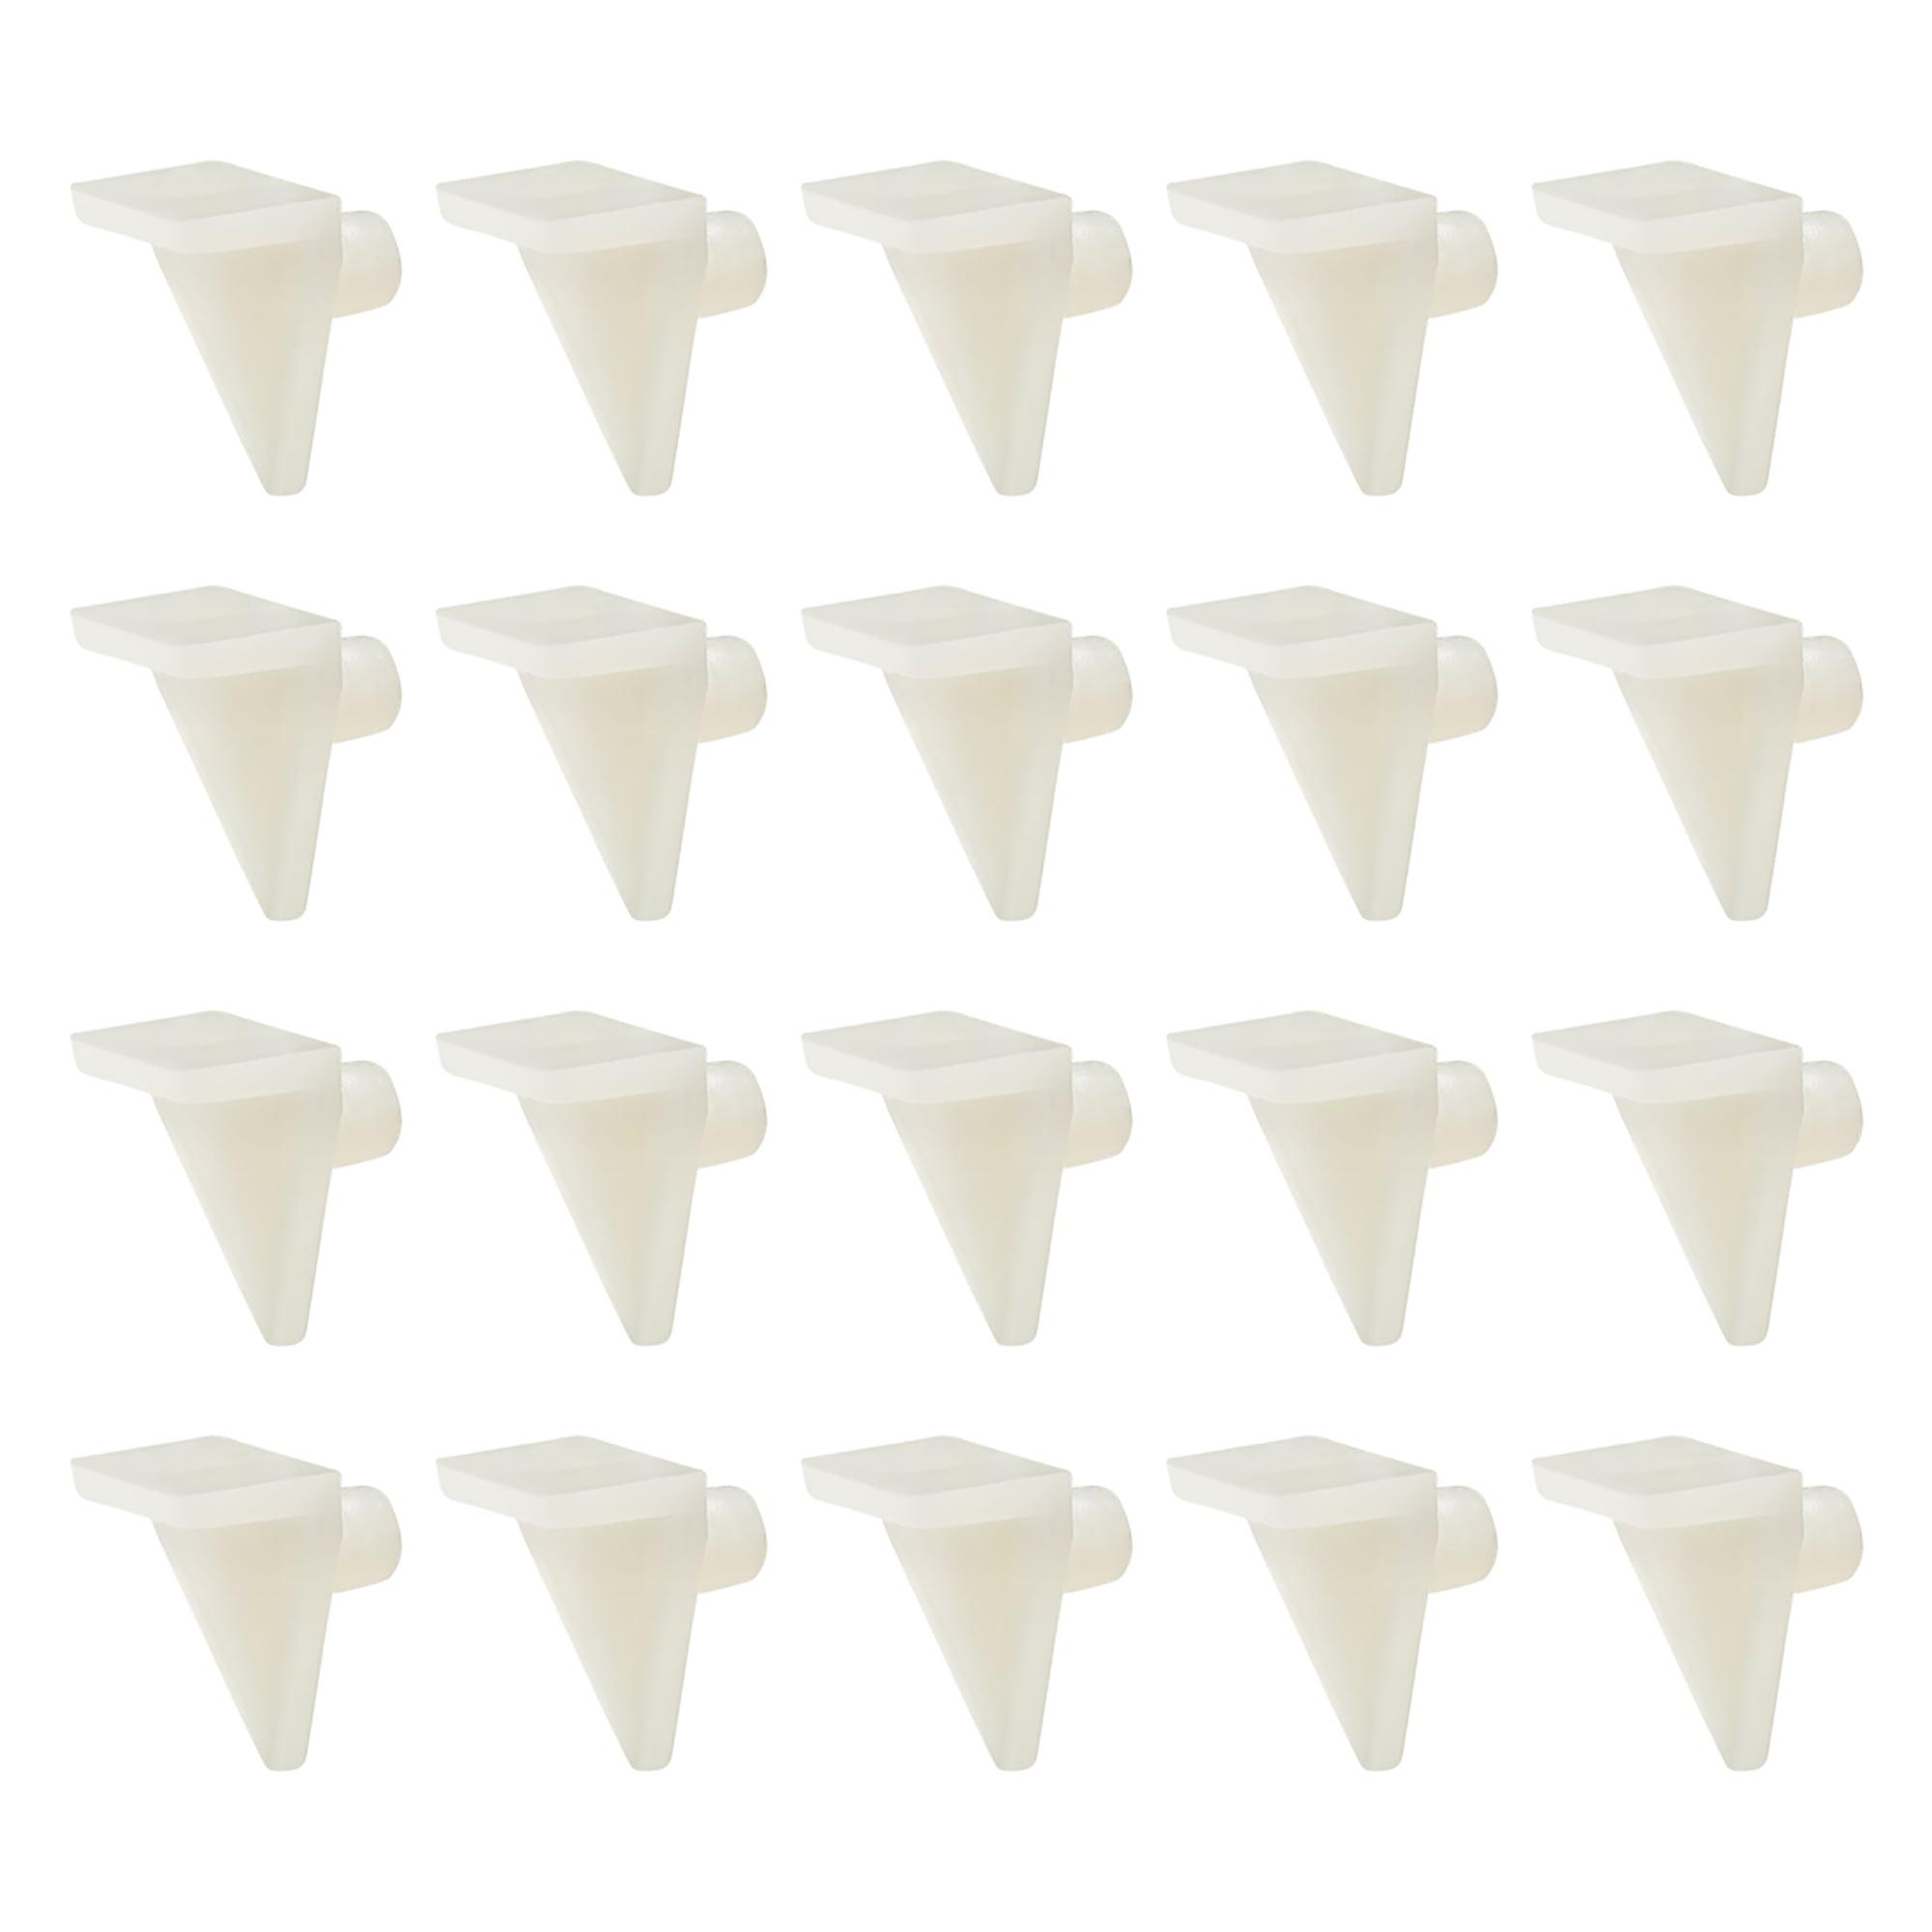 Plastic Shelf Support Pegs 5mm Cabinet Shelf Clips Shelf Bracket Hoder Peg For Kitchen Furniture Book Shelves 20pcs Walmart Com Walmart Com